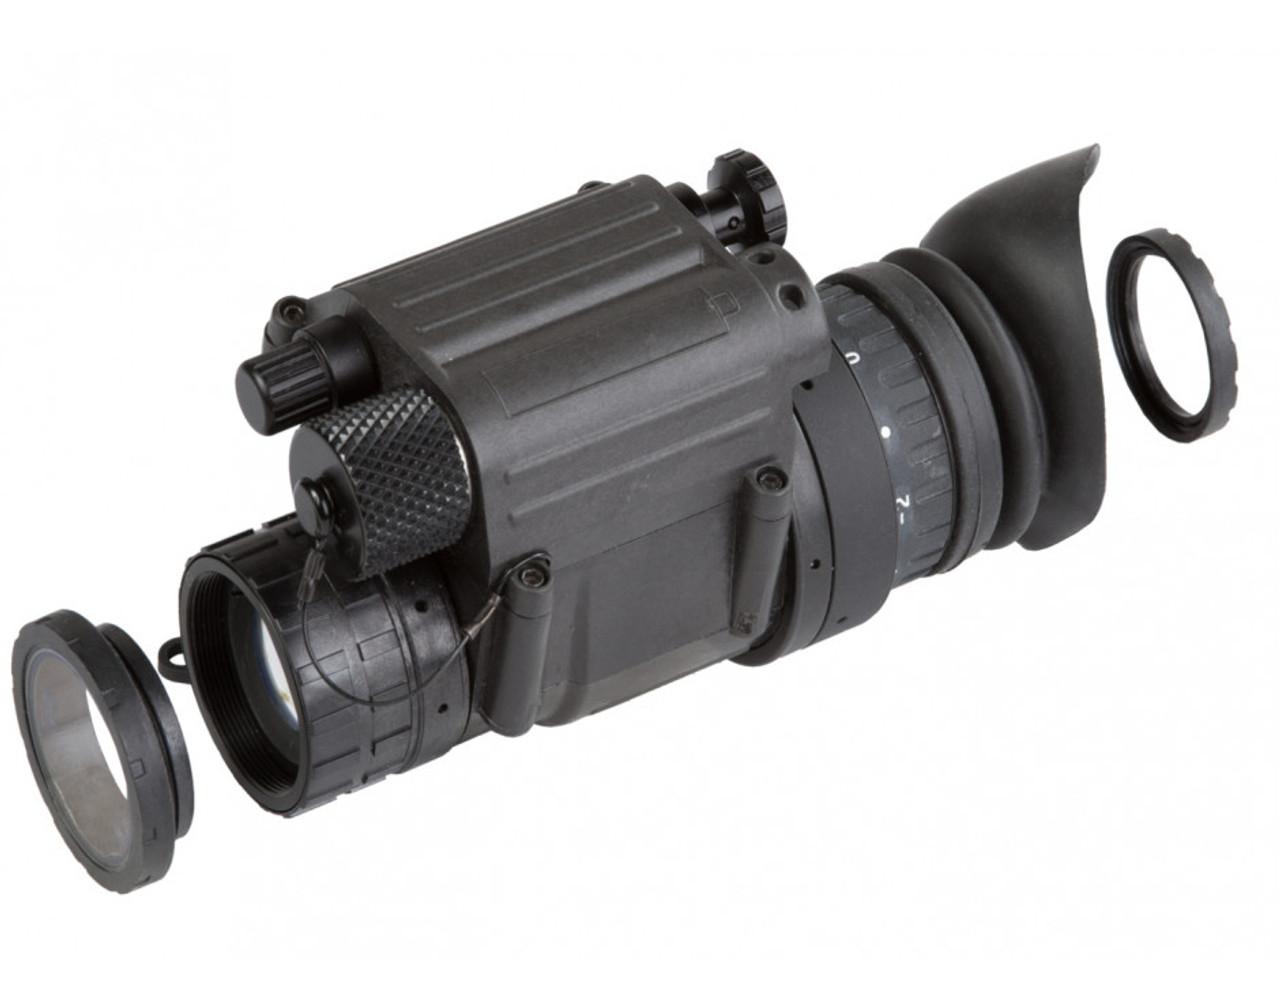 "AGM PVS-14 3AL2 Night Vision Monocular Gen 3+ Auto-Gated ""Level 2"" (AGM PVS-14 3AL2)"